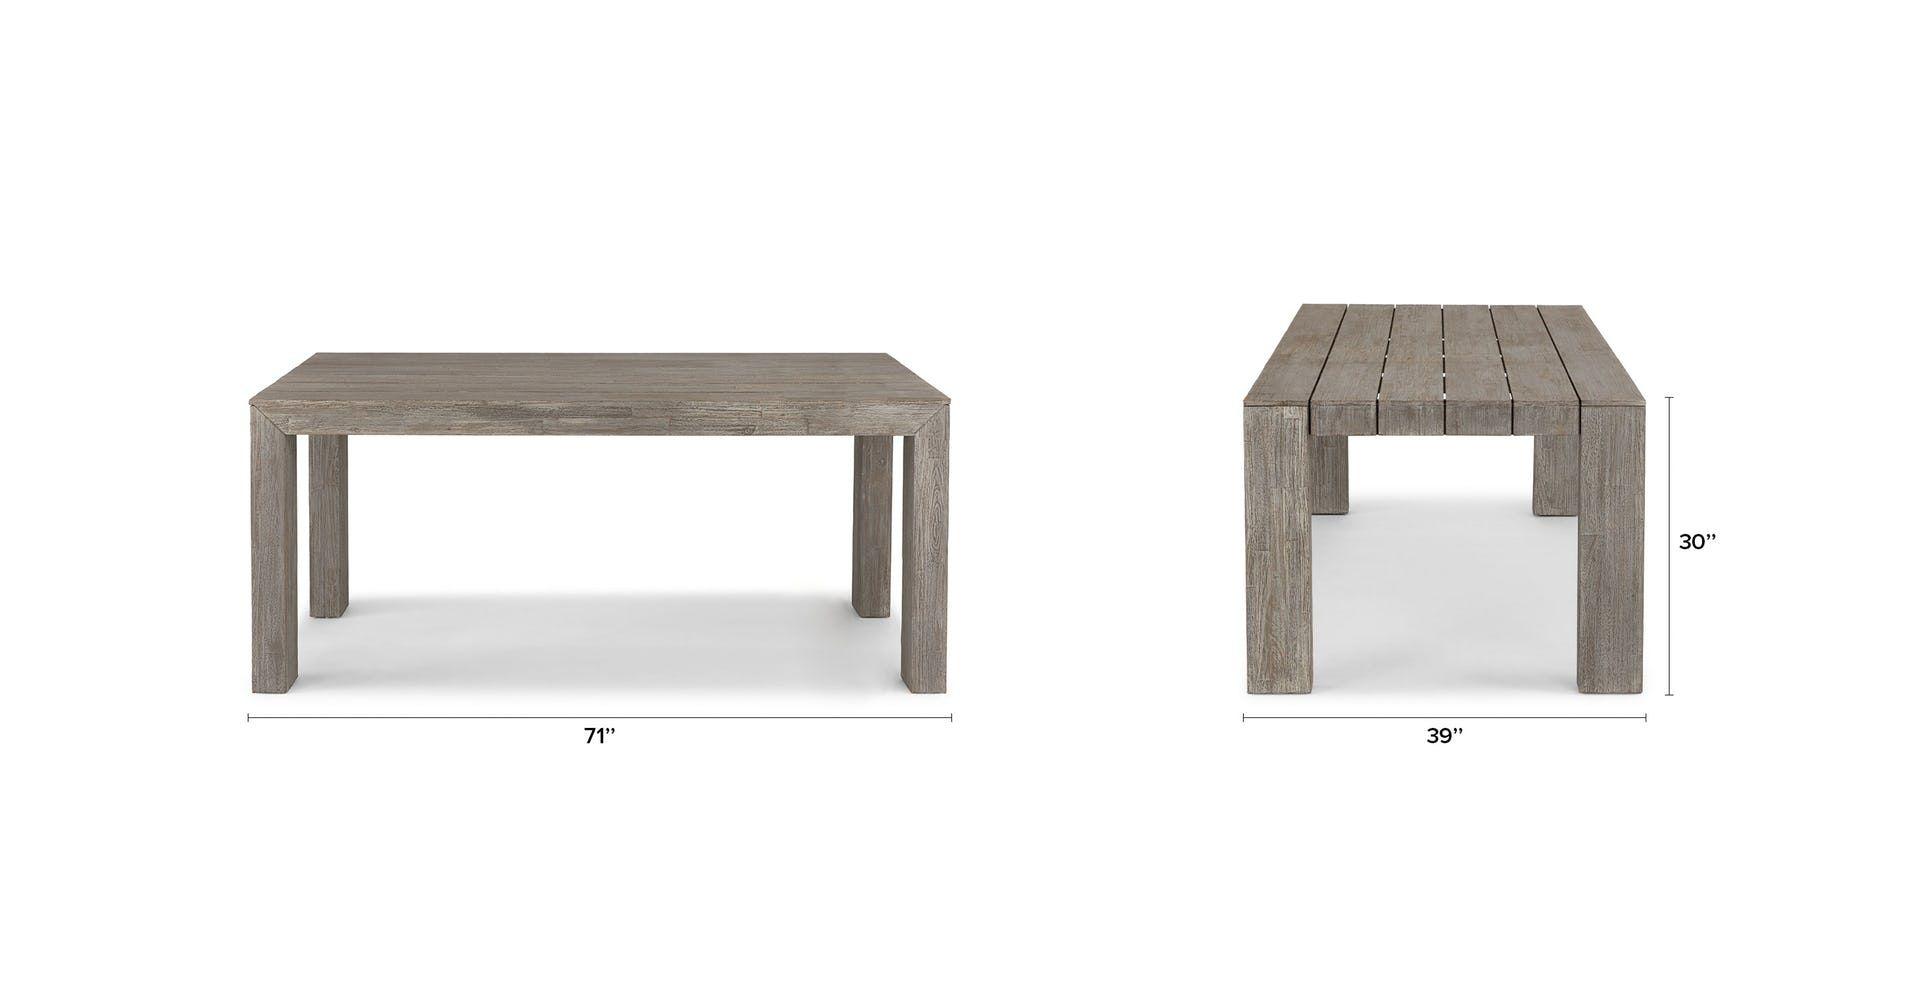 Atica Dining Table For 6 Dining Table Dining Table Decor Modern